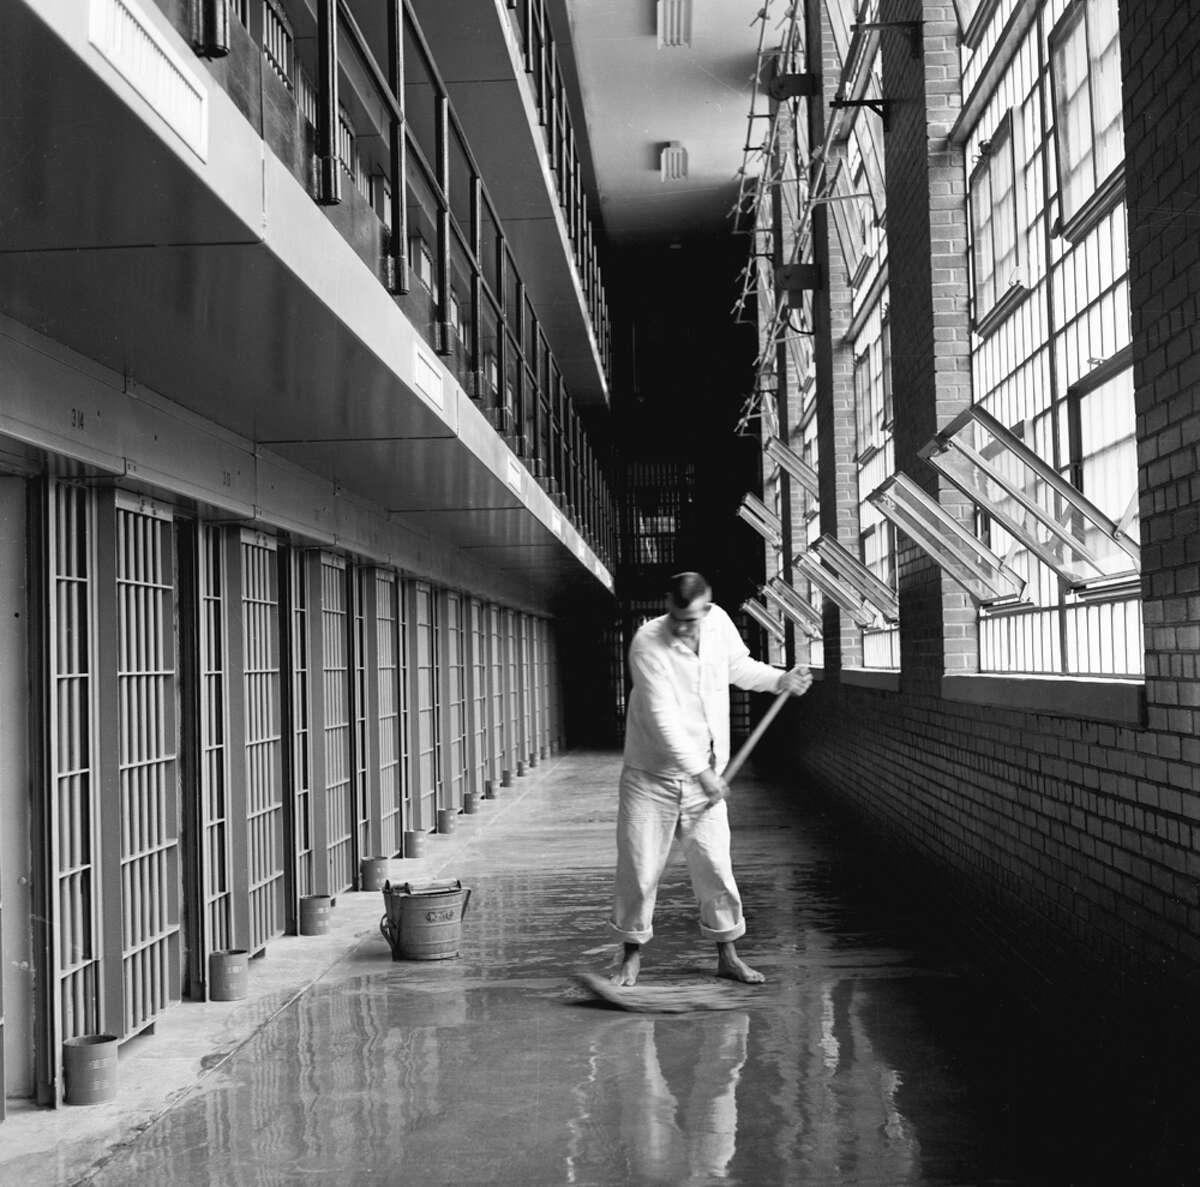 Ferguson Unit, inmate mopping floor, barefoot